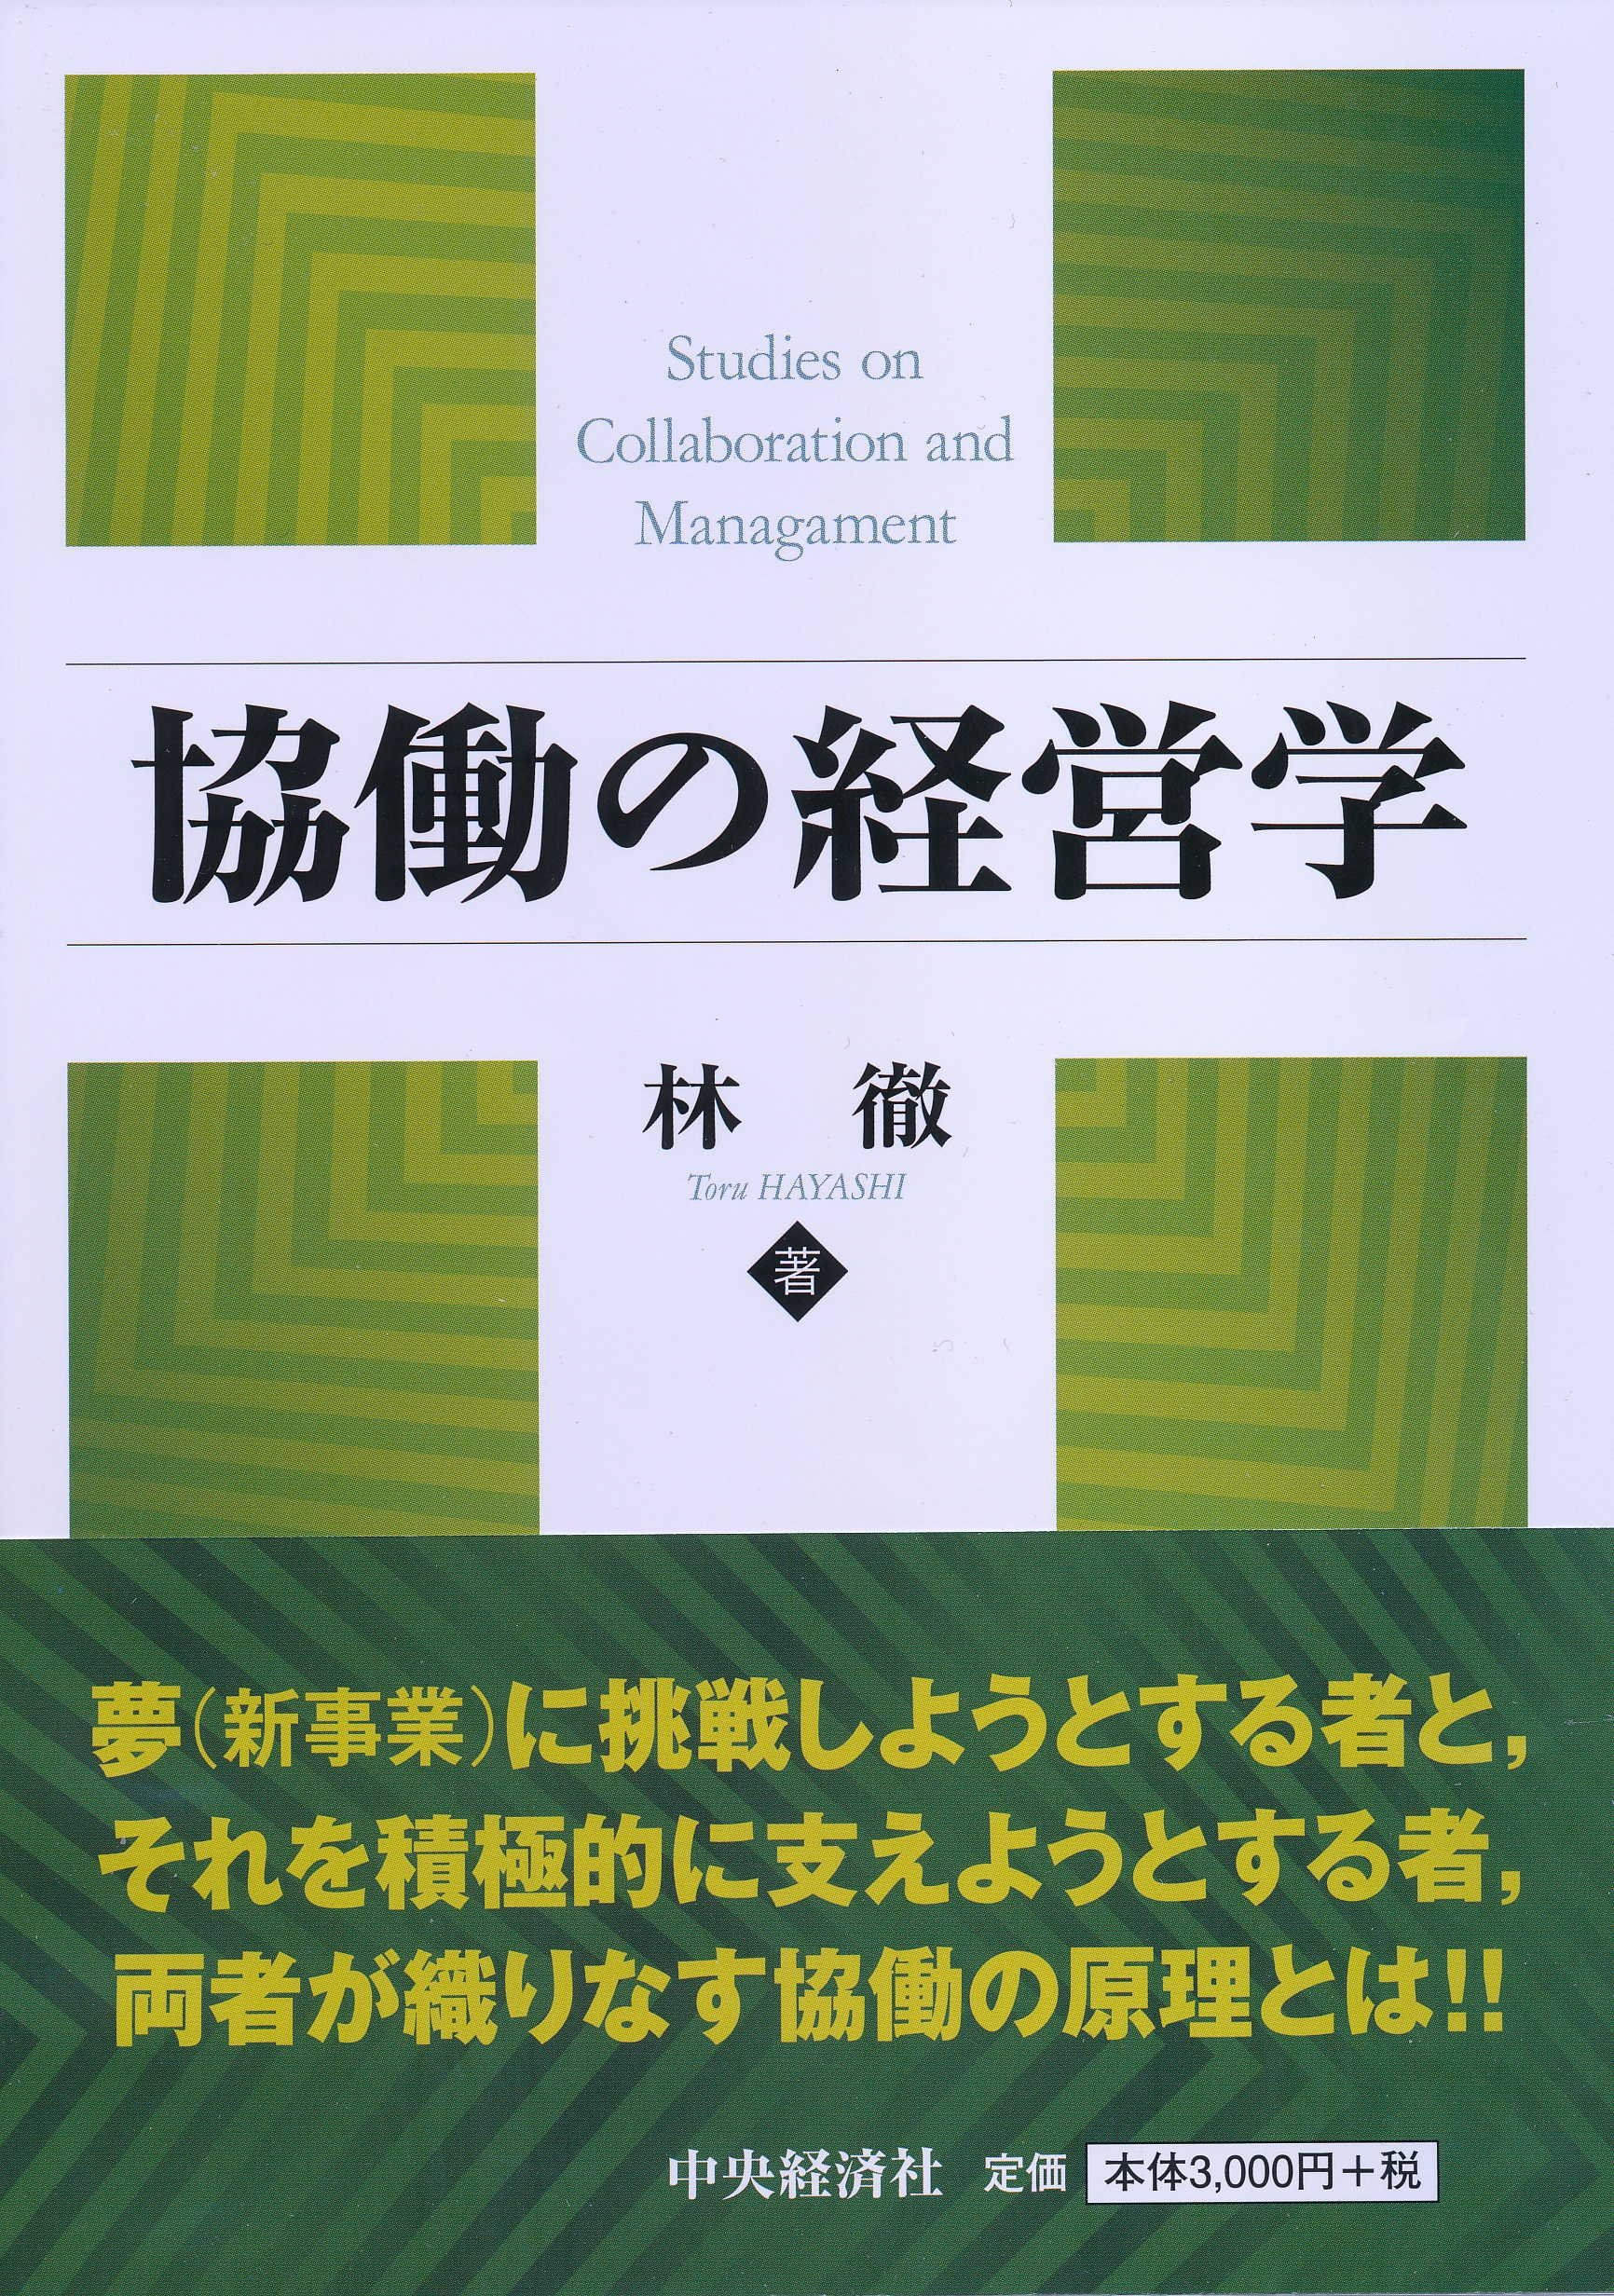 林 徹(長崎大学) 著 『協働の経営学』